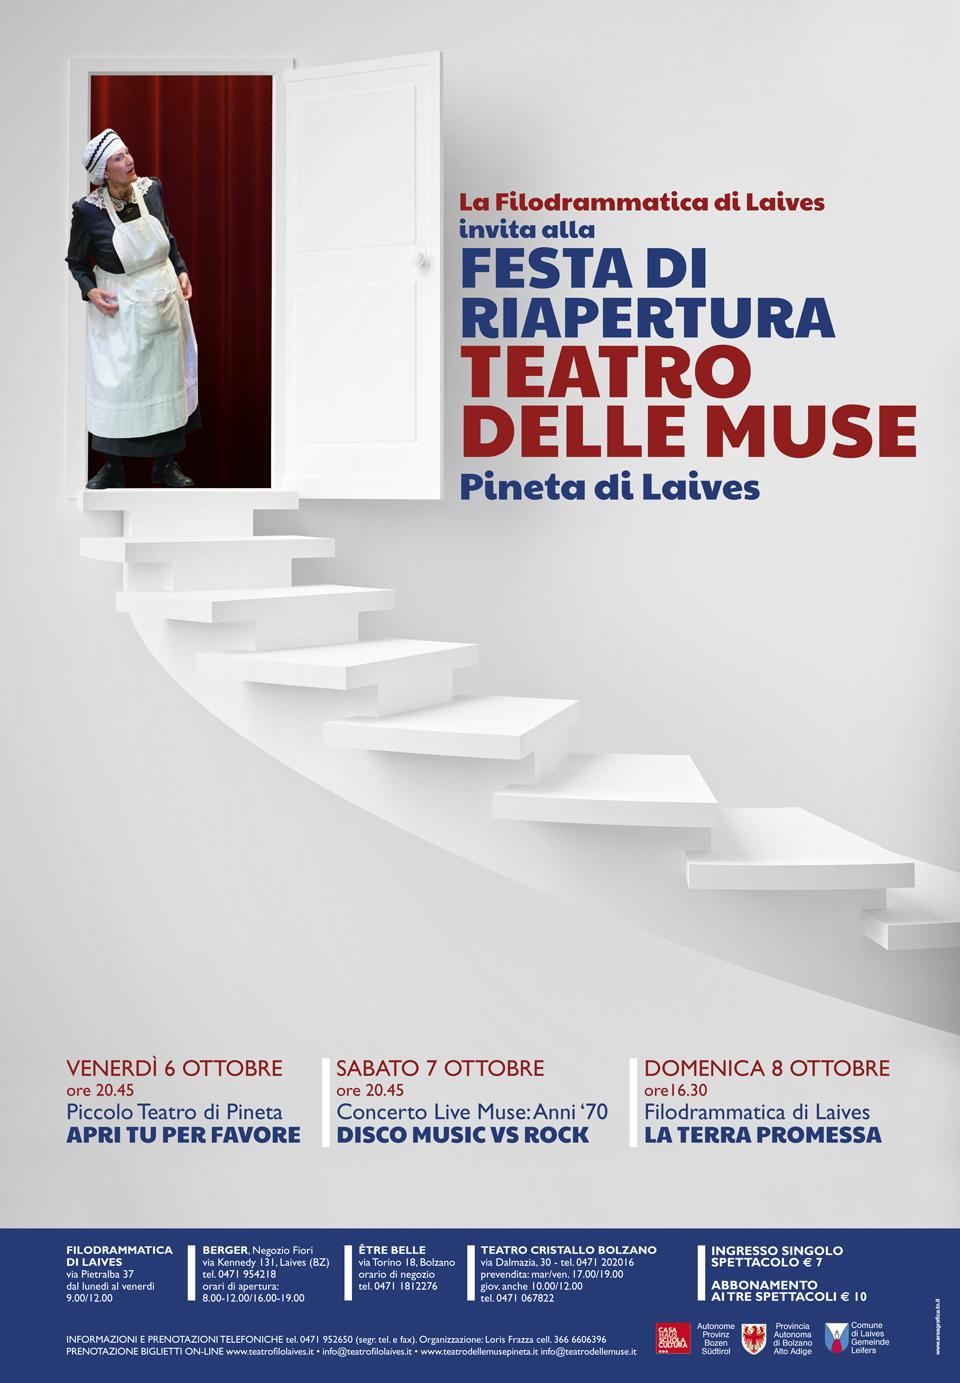 teatro_delle_muse_manifesto_70x100